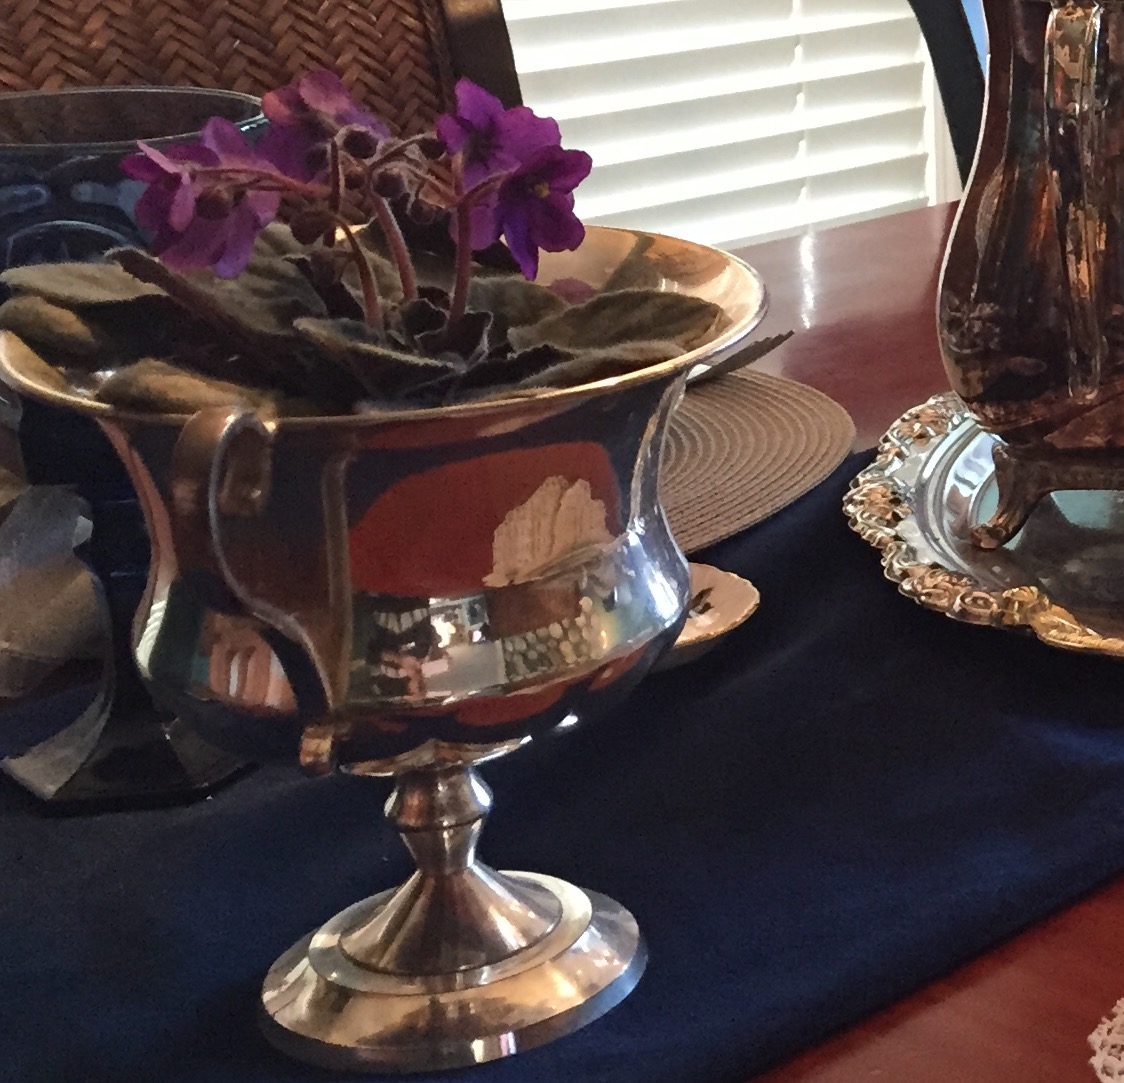 fancy table violets.jpg